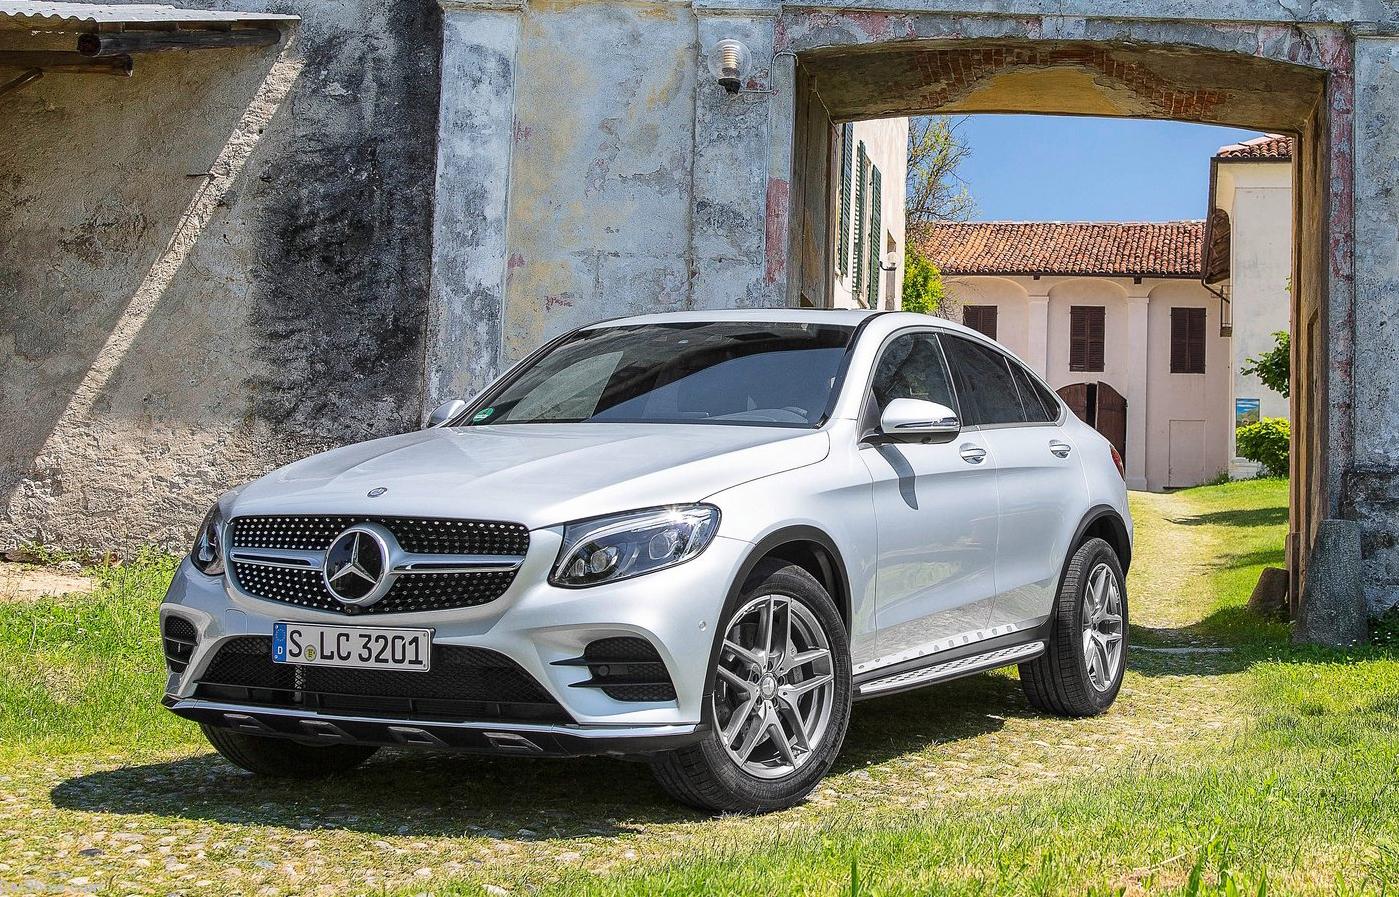 Mercedes glc coup superior al bmw x4 revista de coches for Mercedes benz glc precio